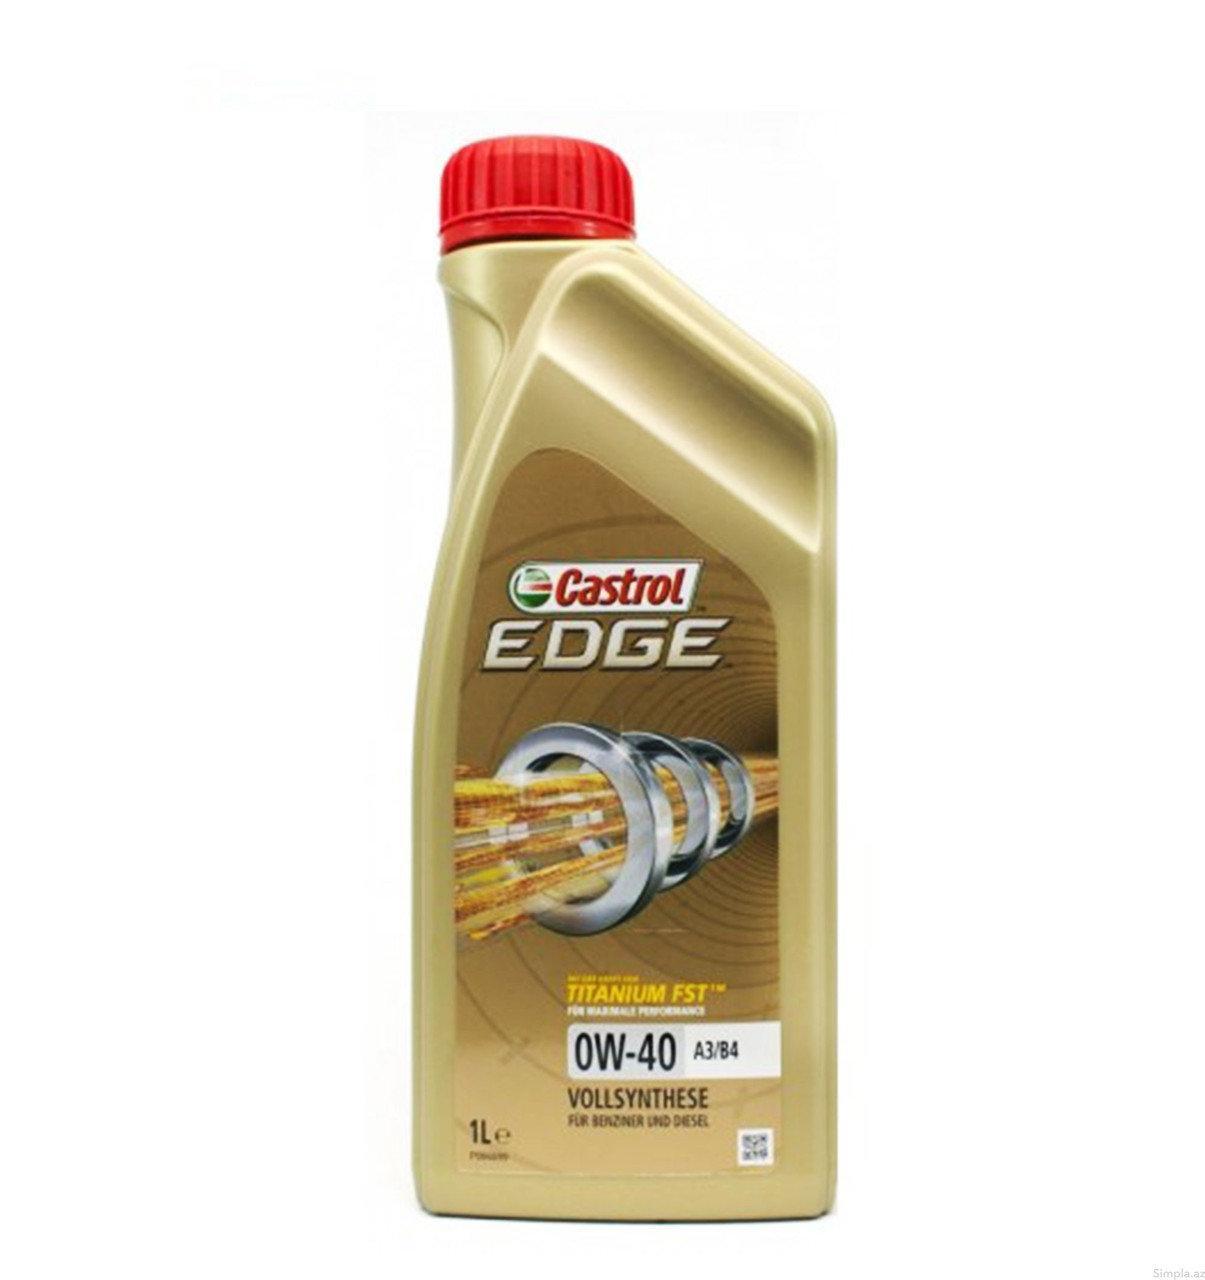 Моторное масло CASTROL EDGE 0W-40 A3/B4 1L